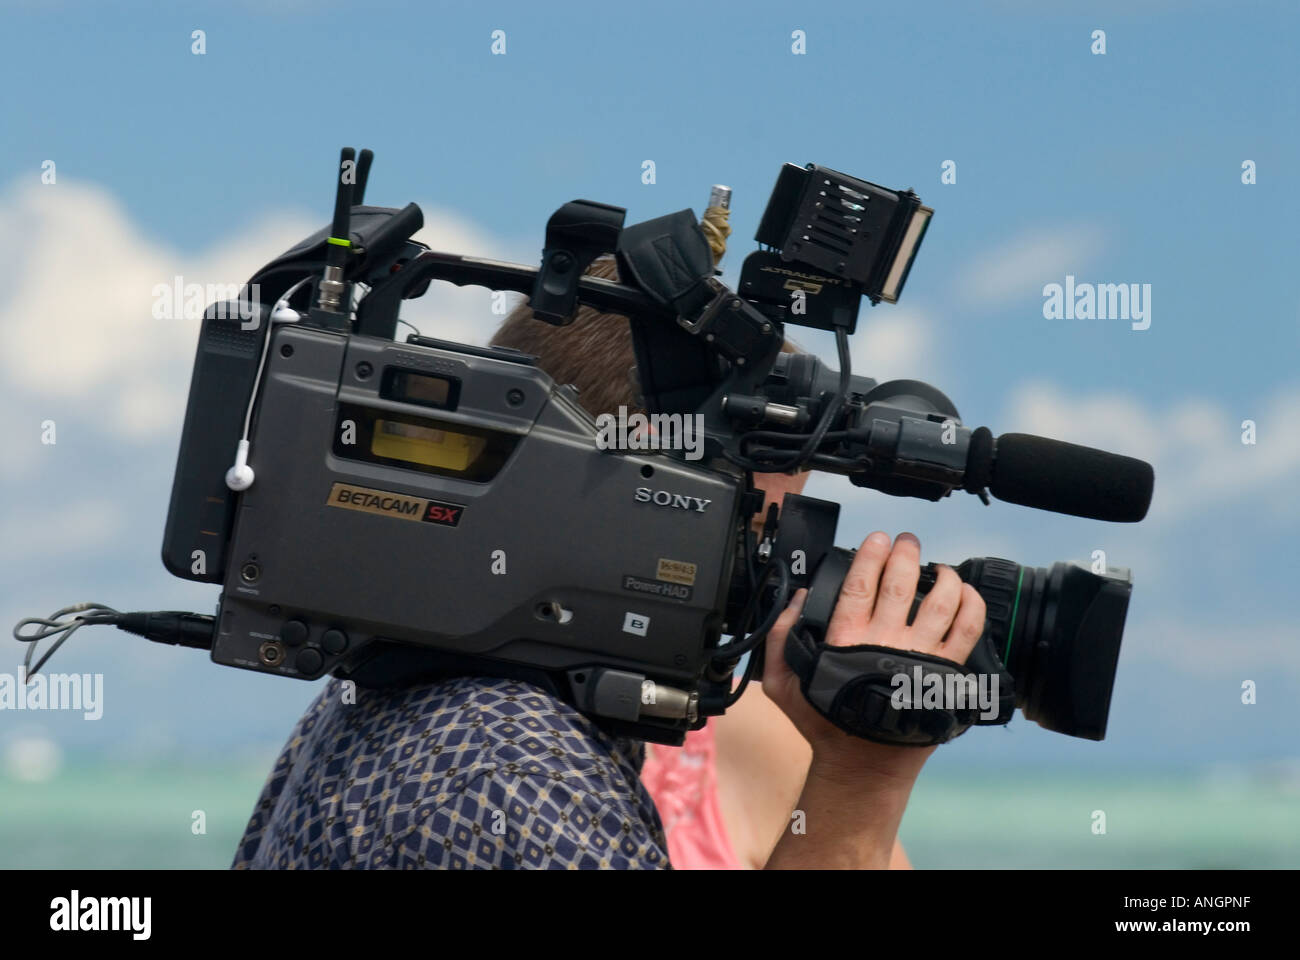 Appareil photo & vidéo Photo Stock